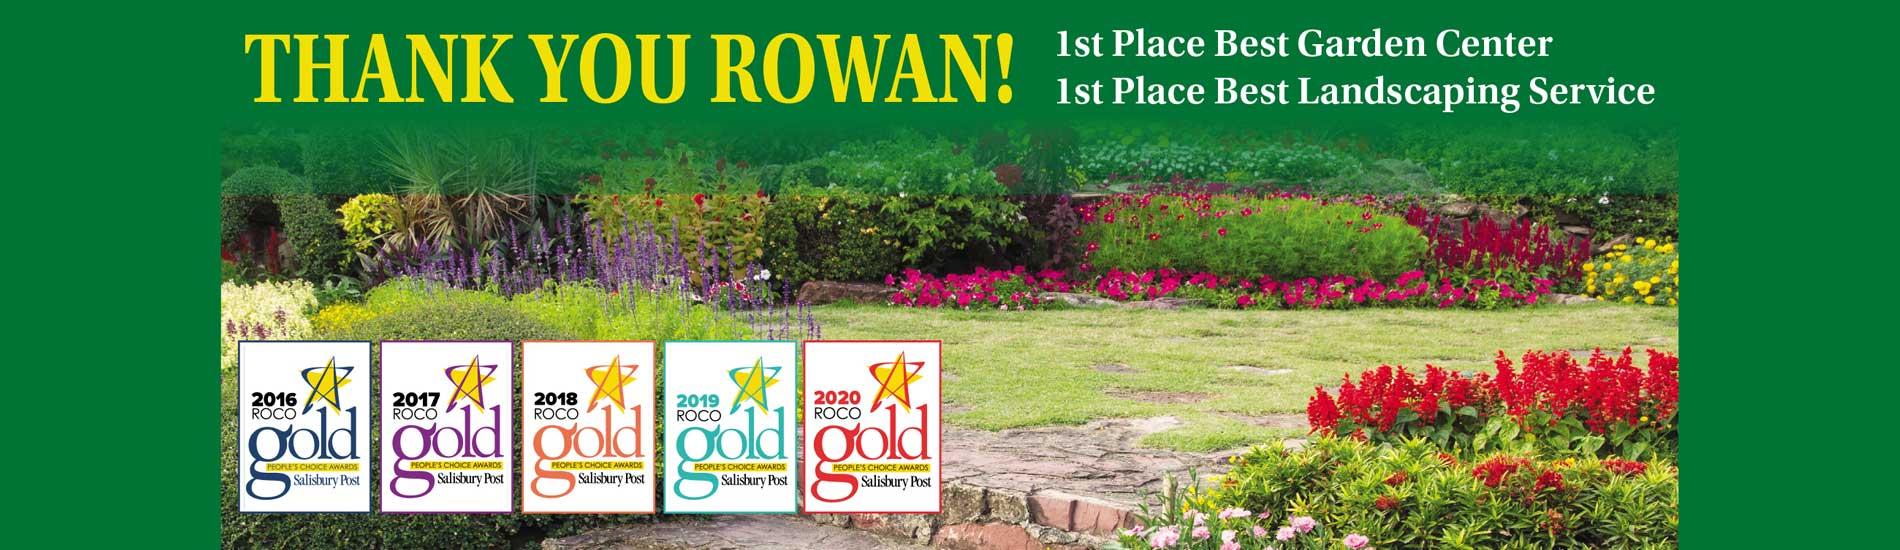 Thank you Rowan